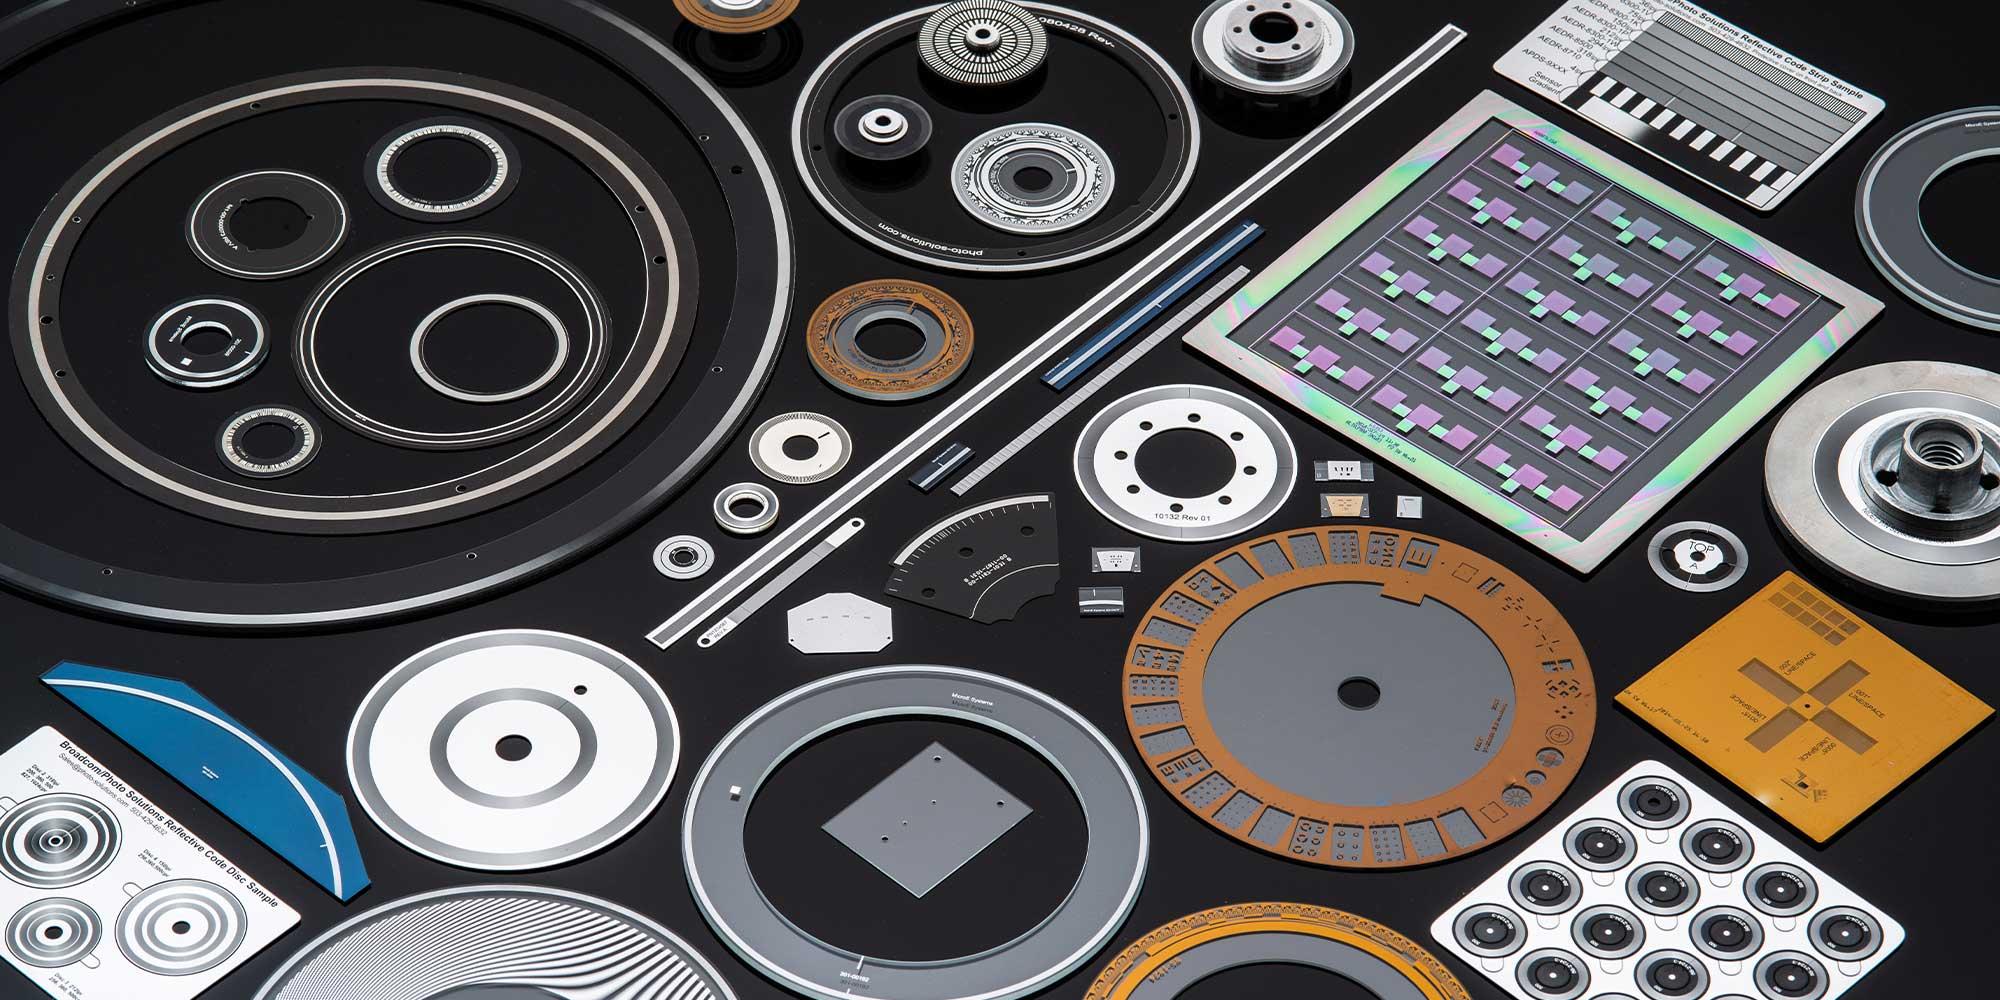 hub and disc assemblies; photonic engineering